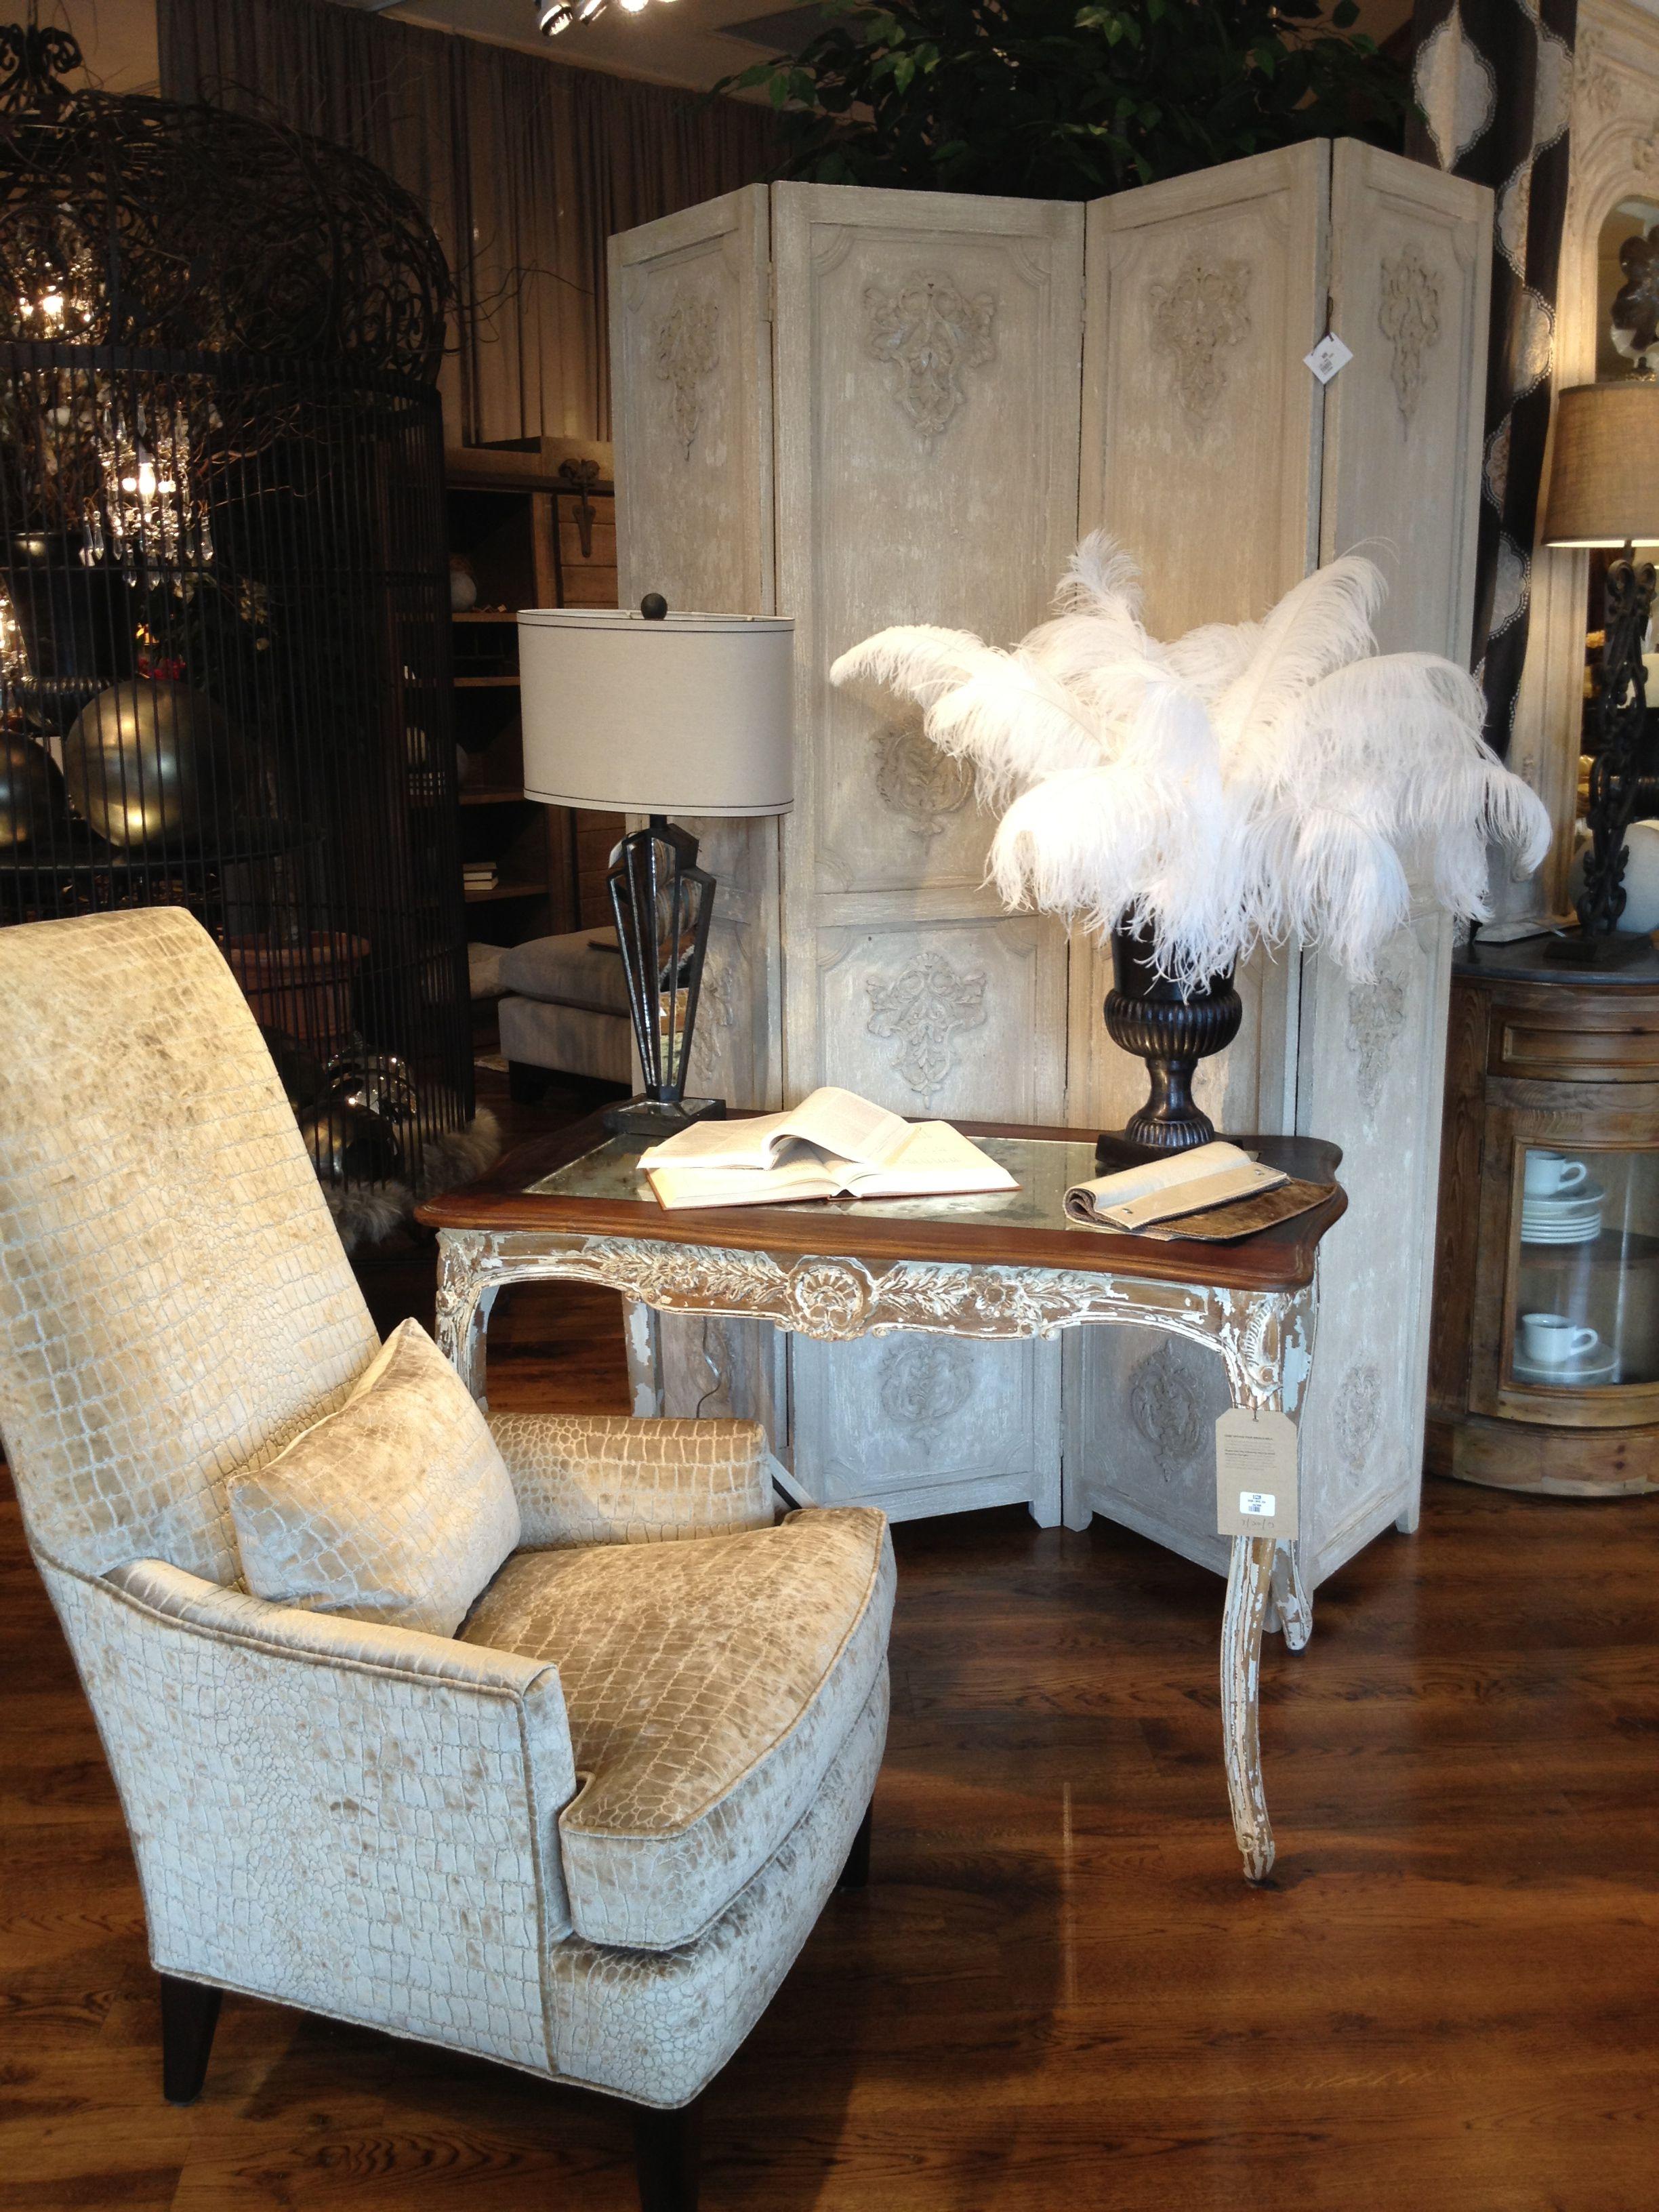 Arhaus Furniture And Design Inspiration. OhioFarmhouseFacts